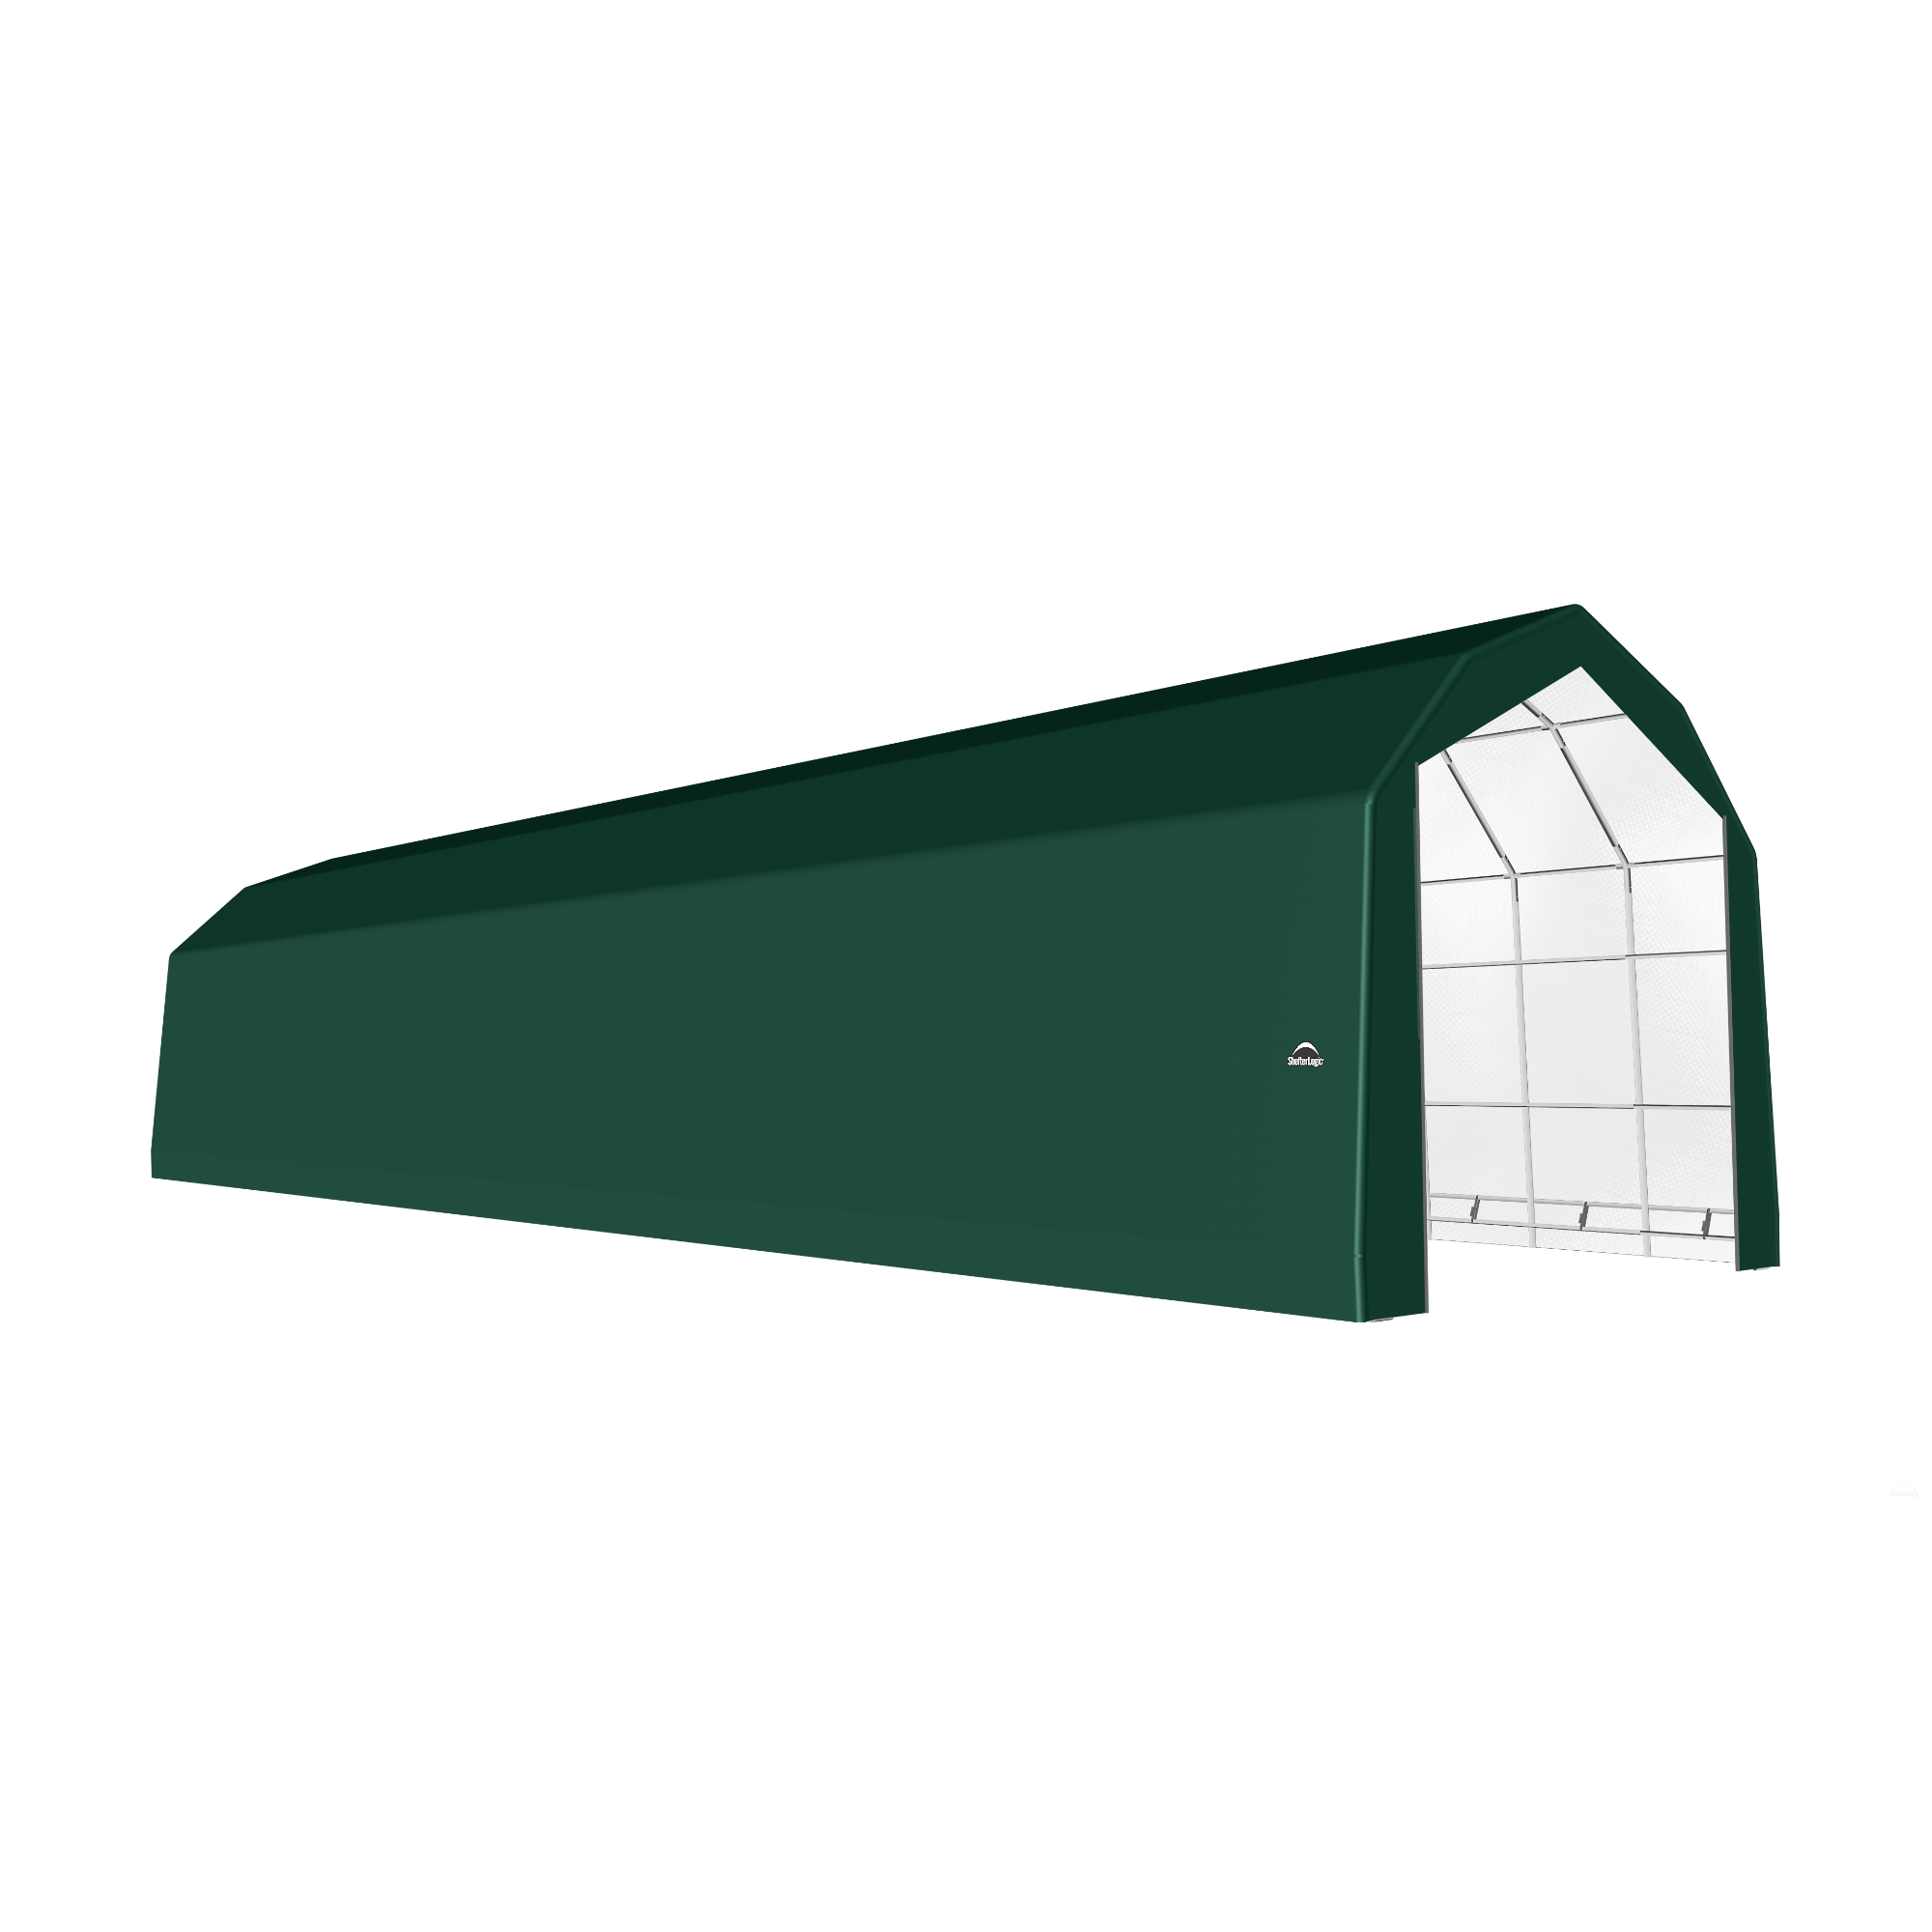 SP Barn 20X84X18 Green 14 oz PE Shelter